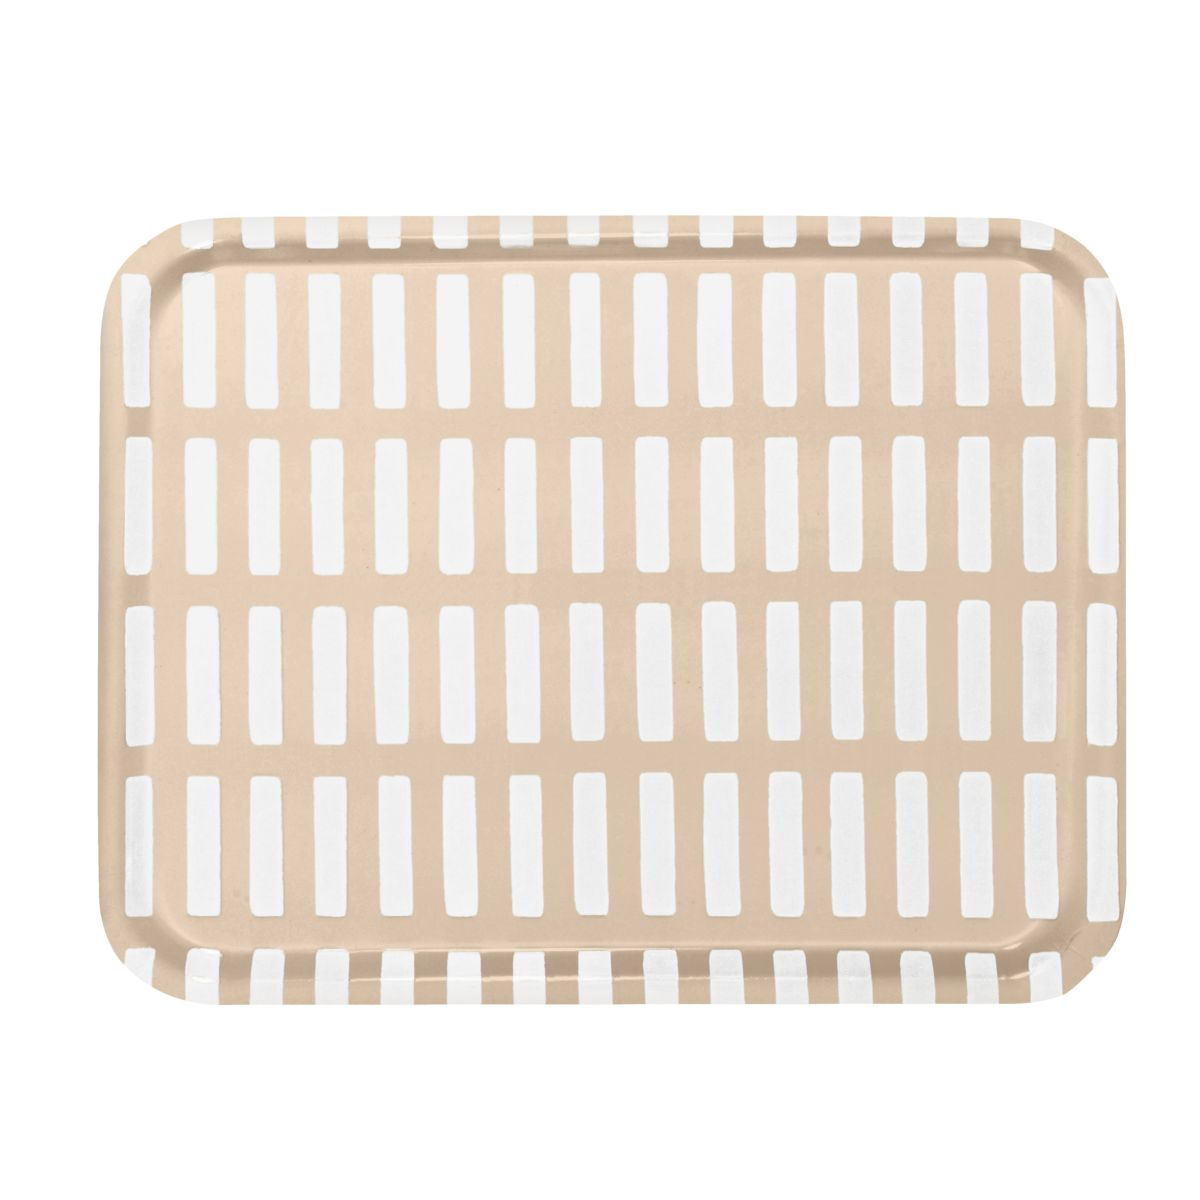 Siena-Tray-large-sand-white-3976922